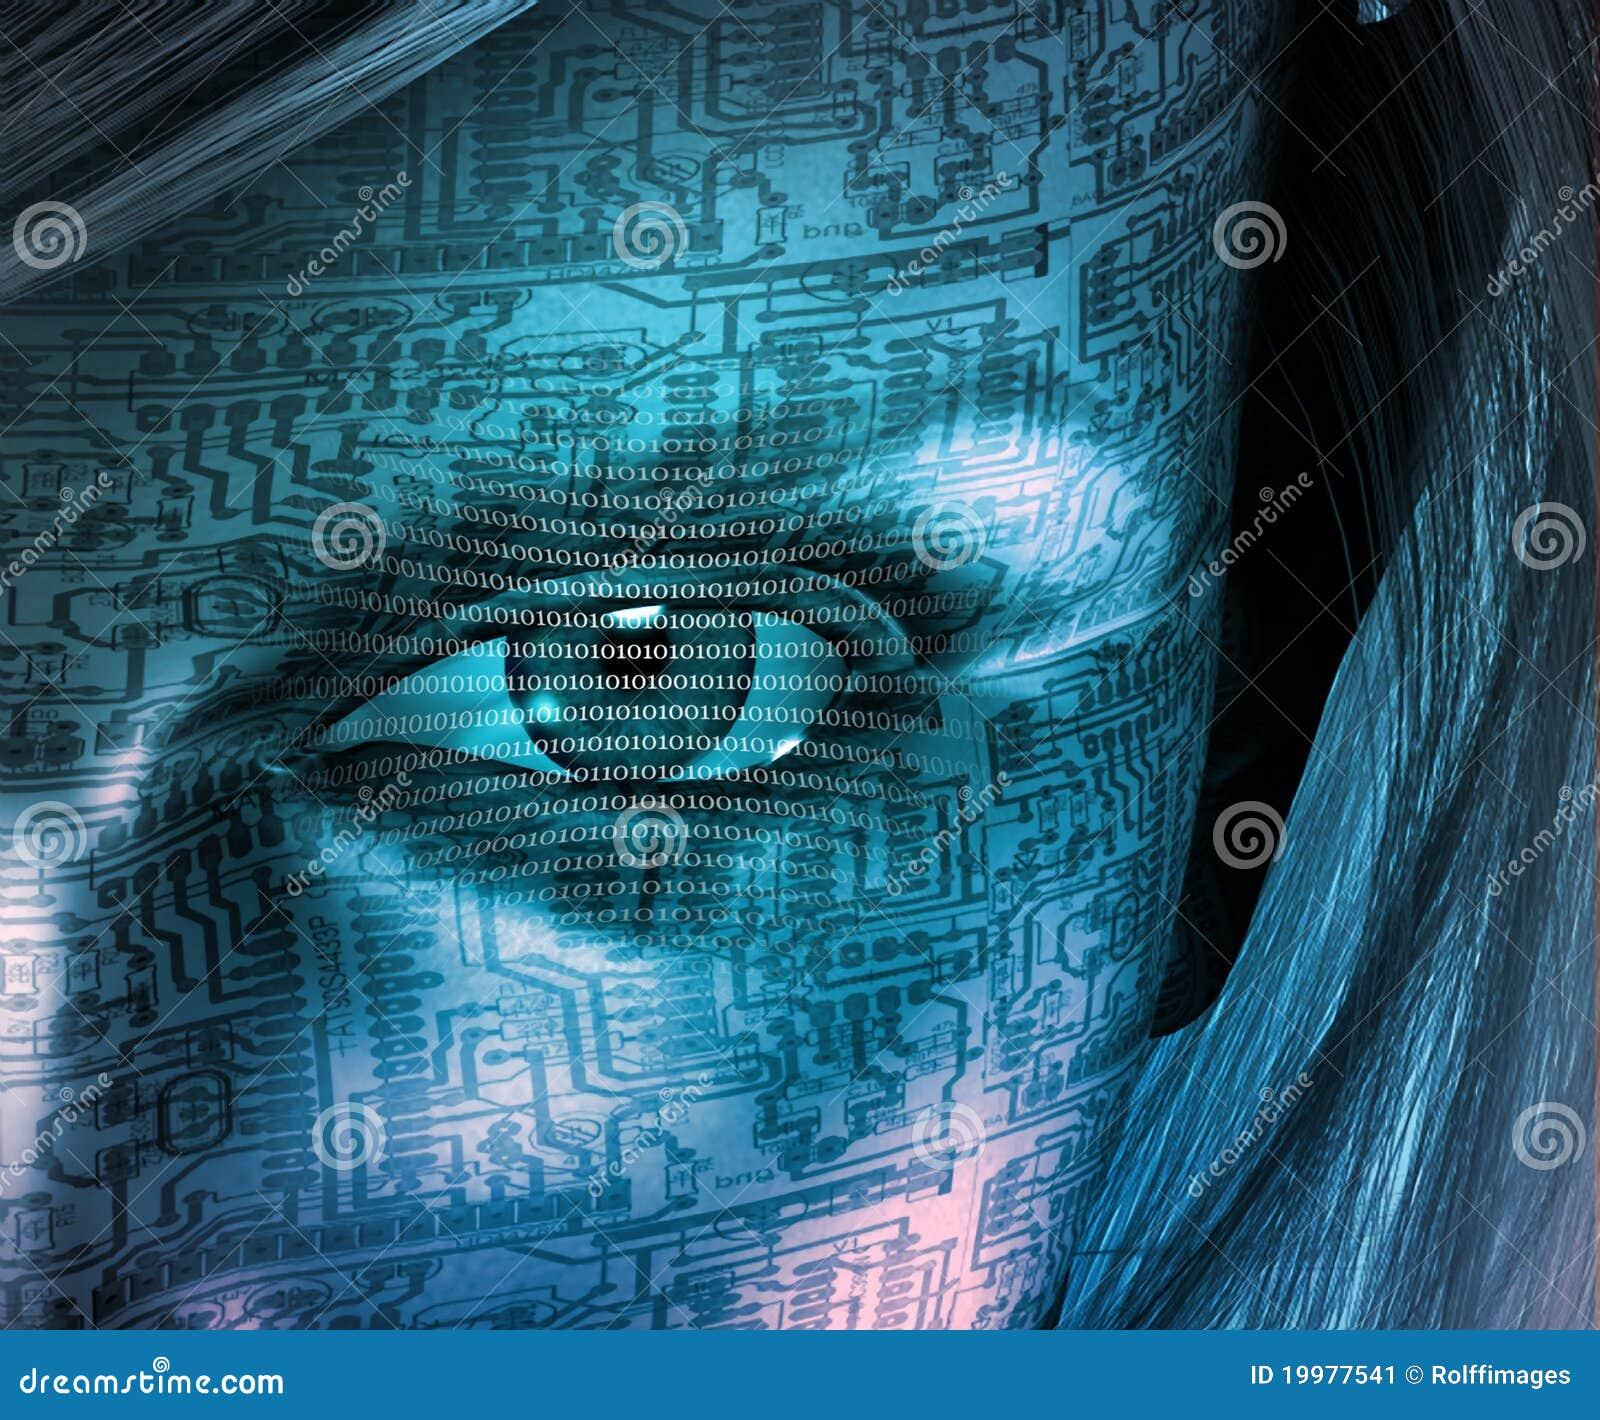 technology human illustration 3d preview dreamstime